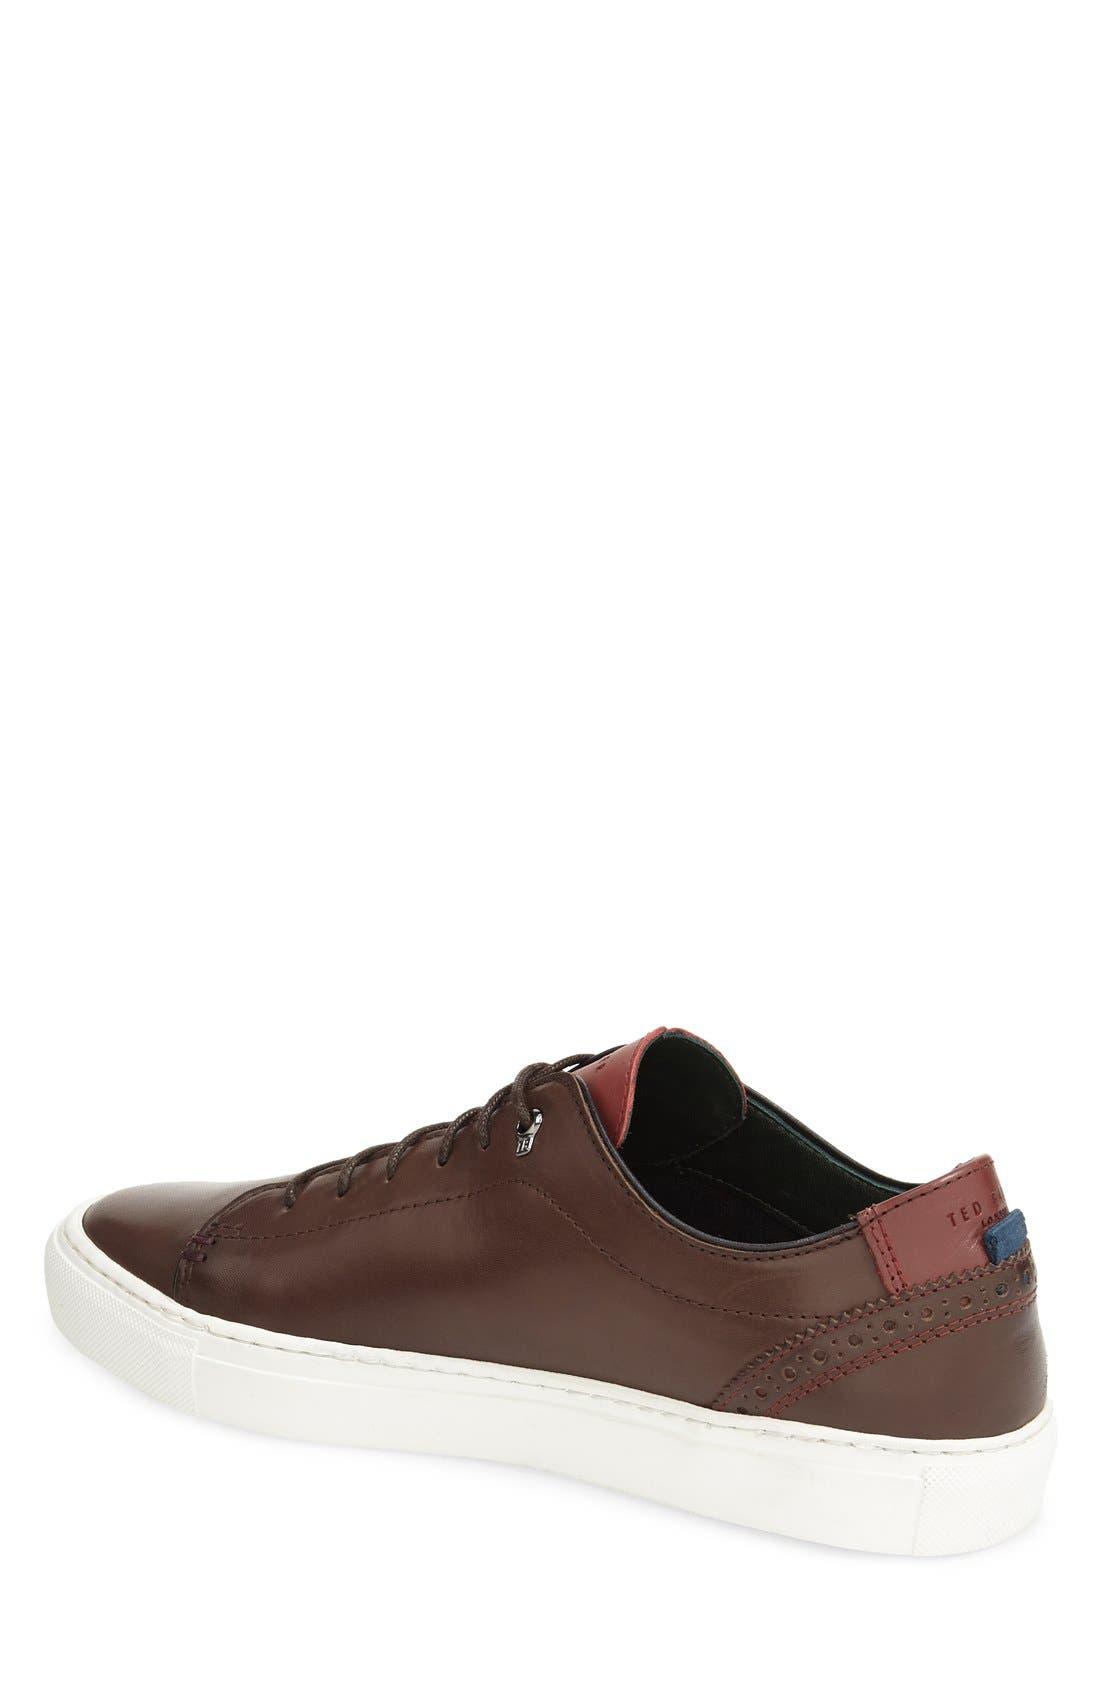 'Kiing Classic' Sneaker,                             Alternate thumbnail 42, color,